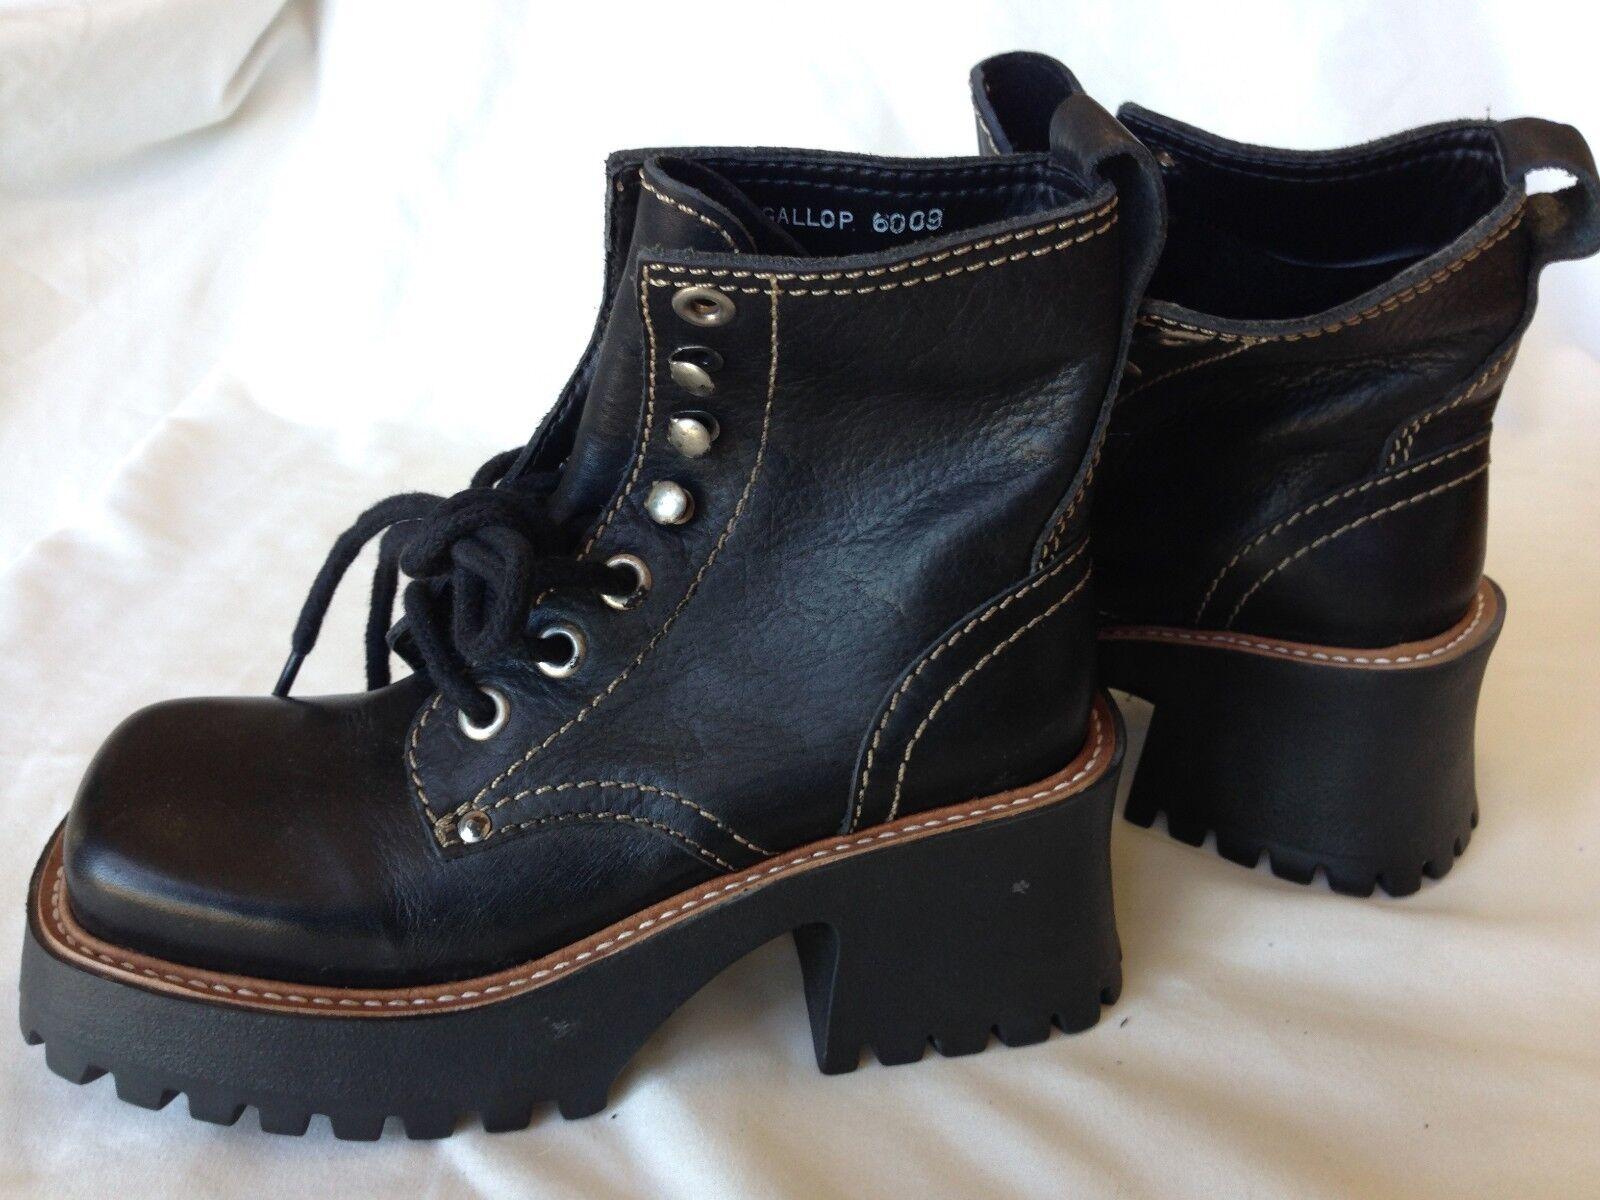 Basswood Gallop 6009 Black Leather Lace Up Platform Heel Boots New Punk Wm 5.5M